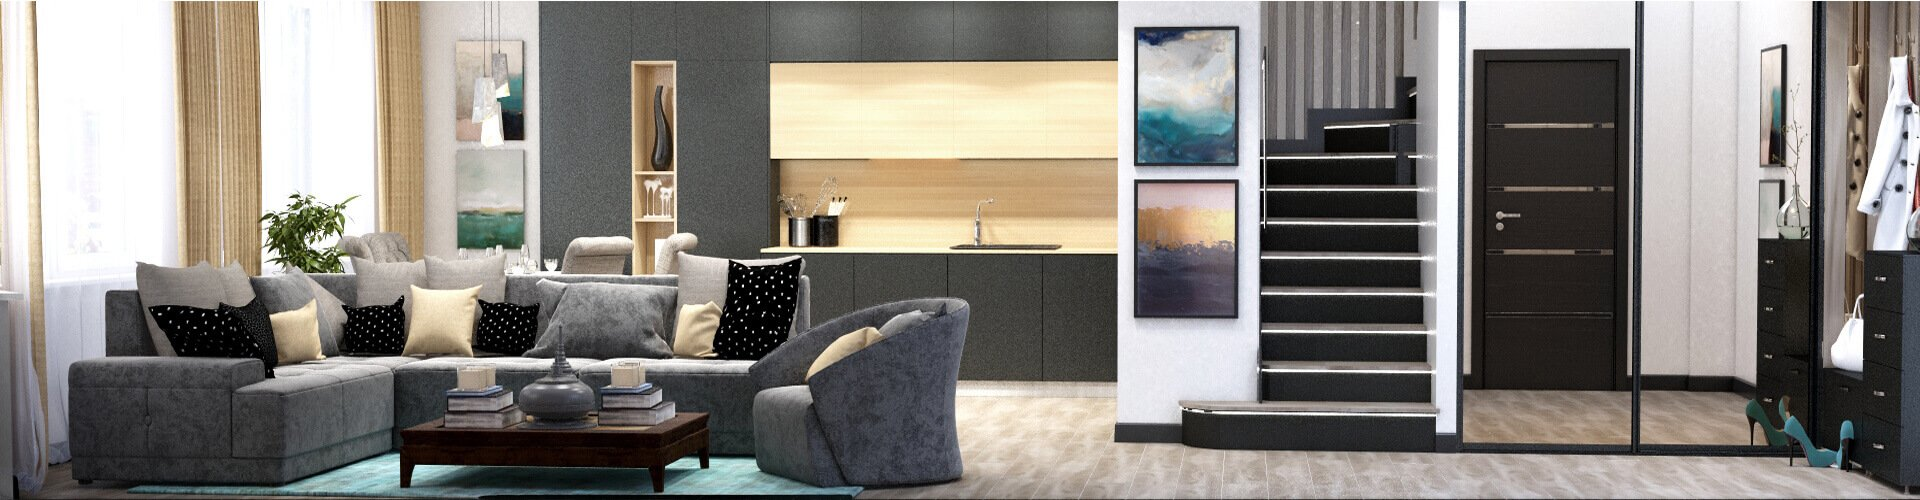 Дизайн интерьера квартиры © AbiStyle Дизайн студия в Киеве